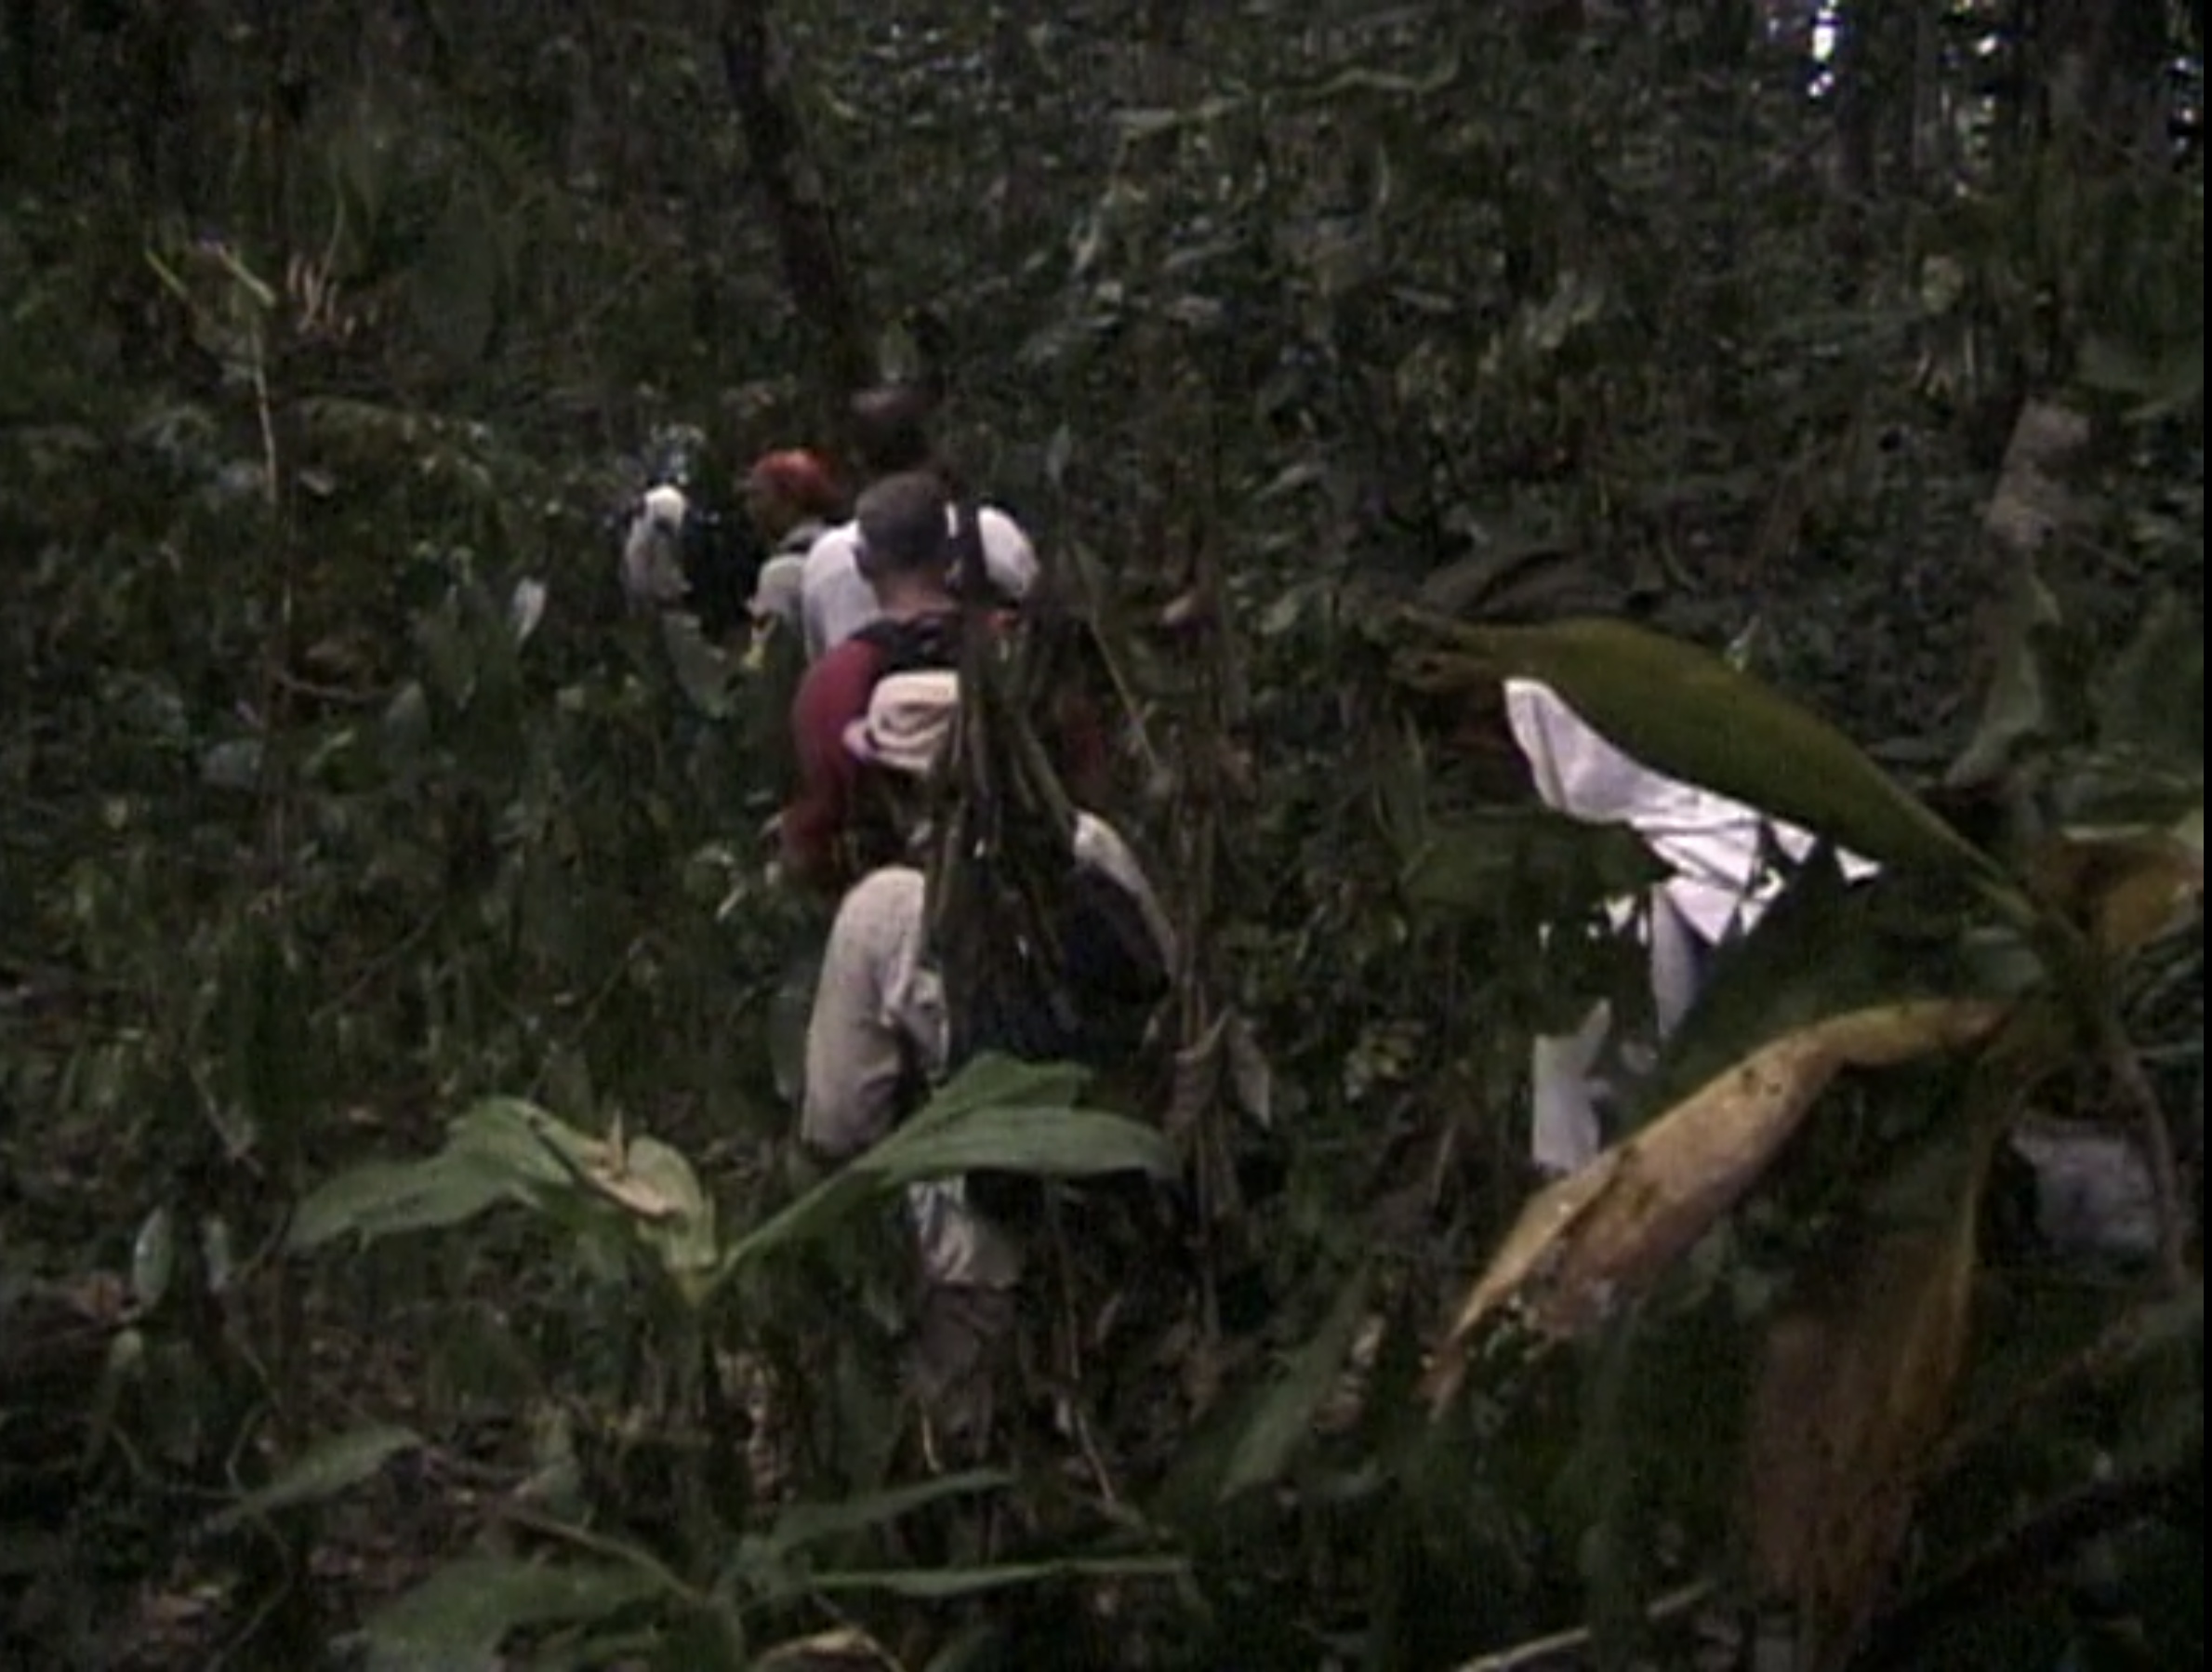 A tribe hikes through the dense forest on Survivor: Borneo